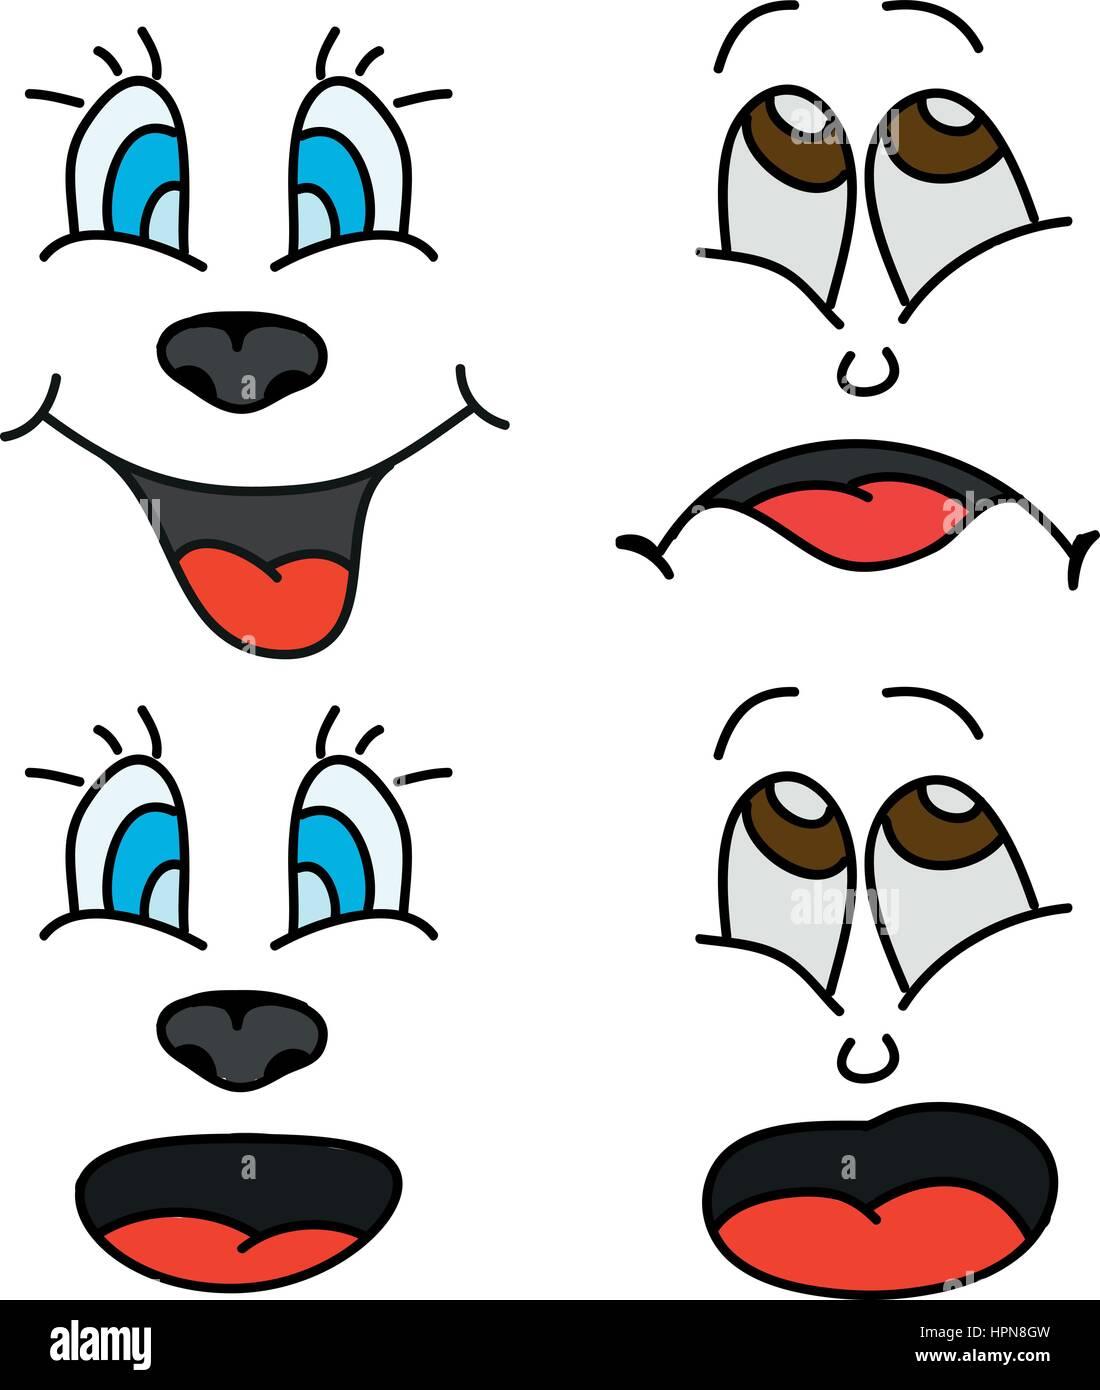 Four Facial cartoon expressions - Stock Image